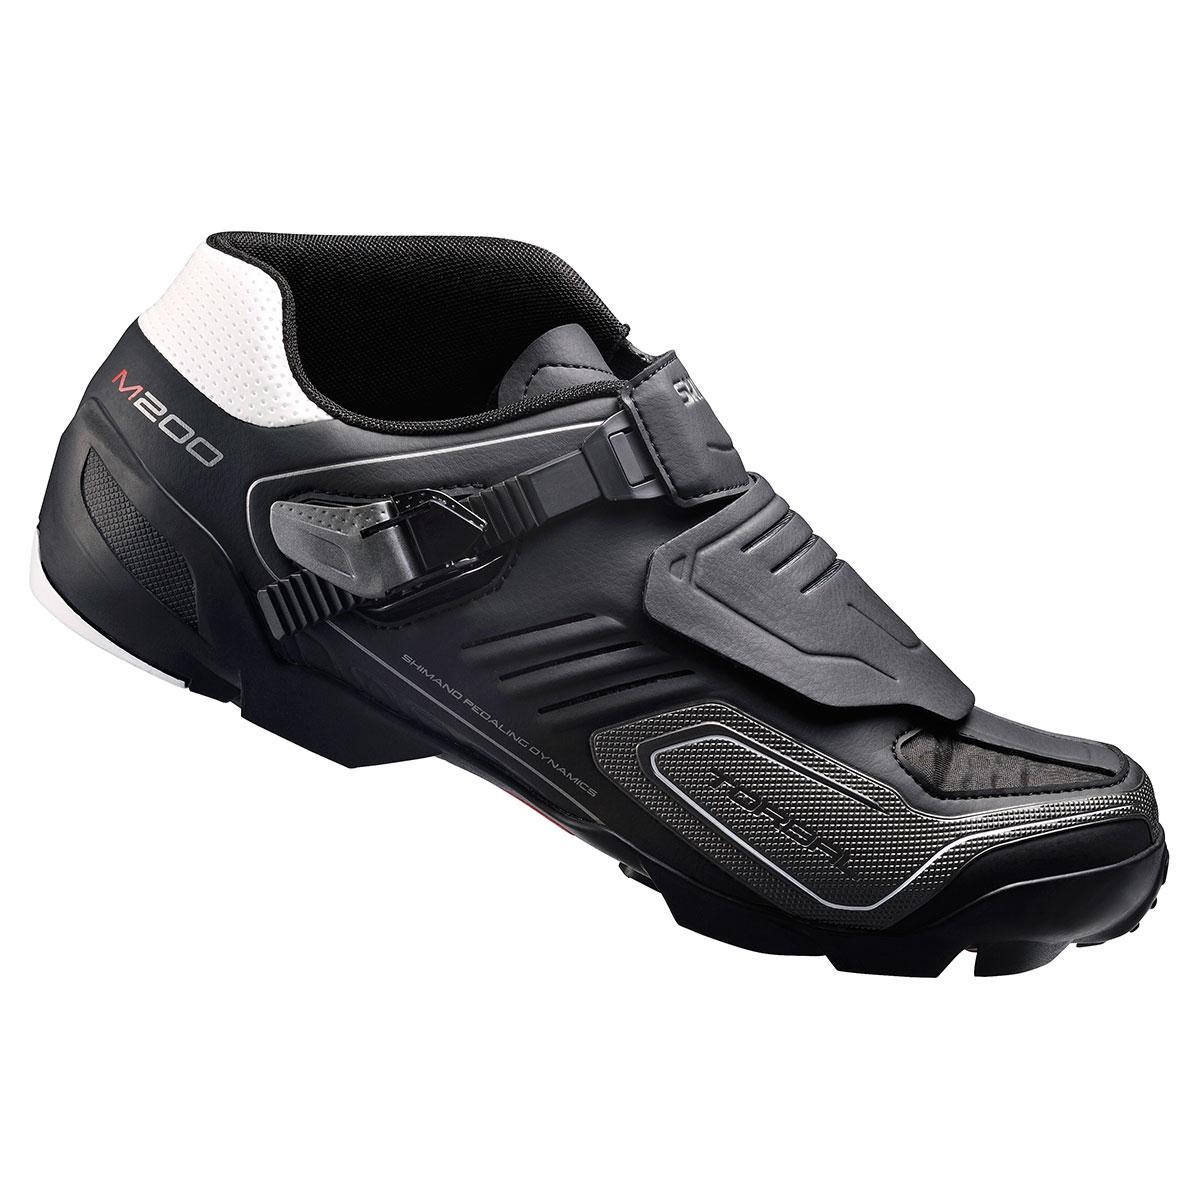 ESHM200C410L Shimano (M200) MTB Shoe